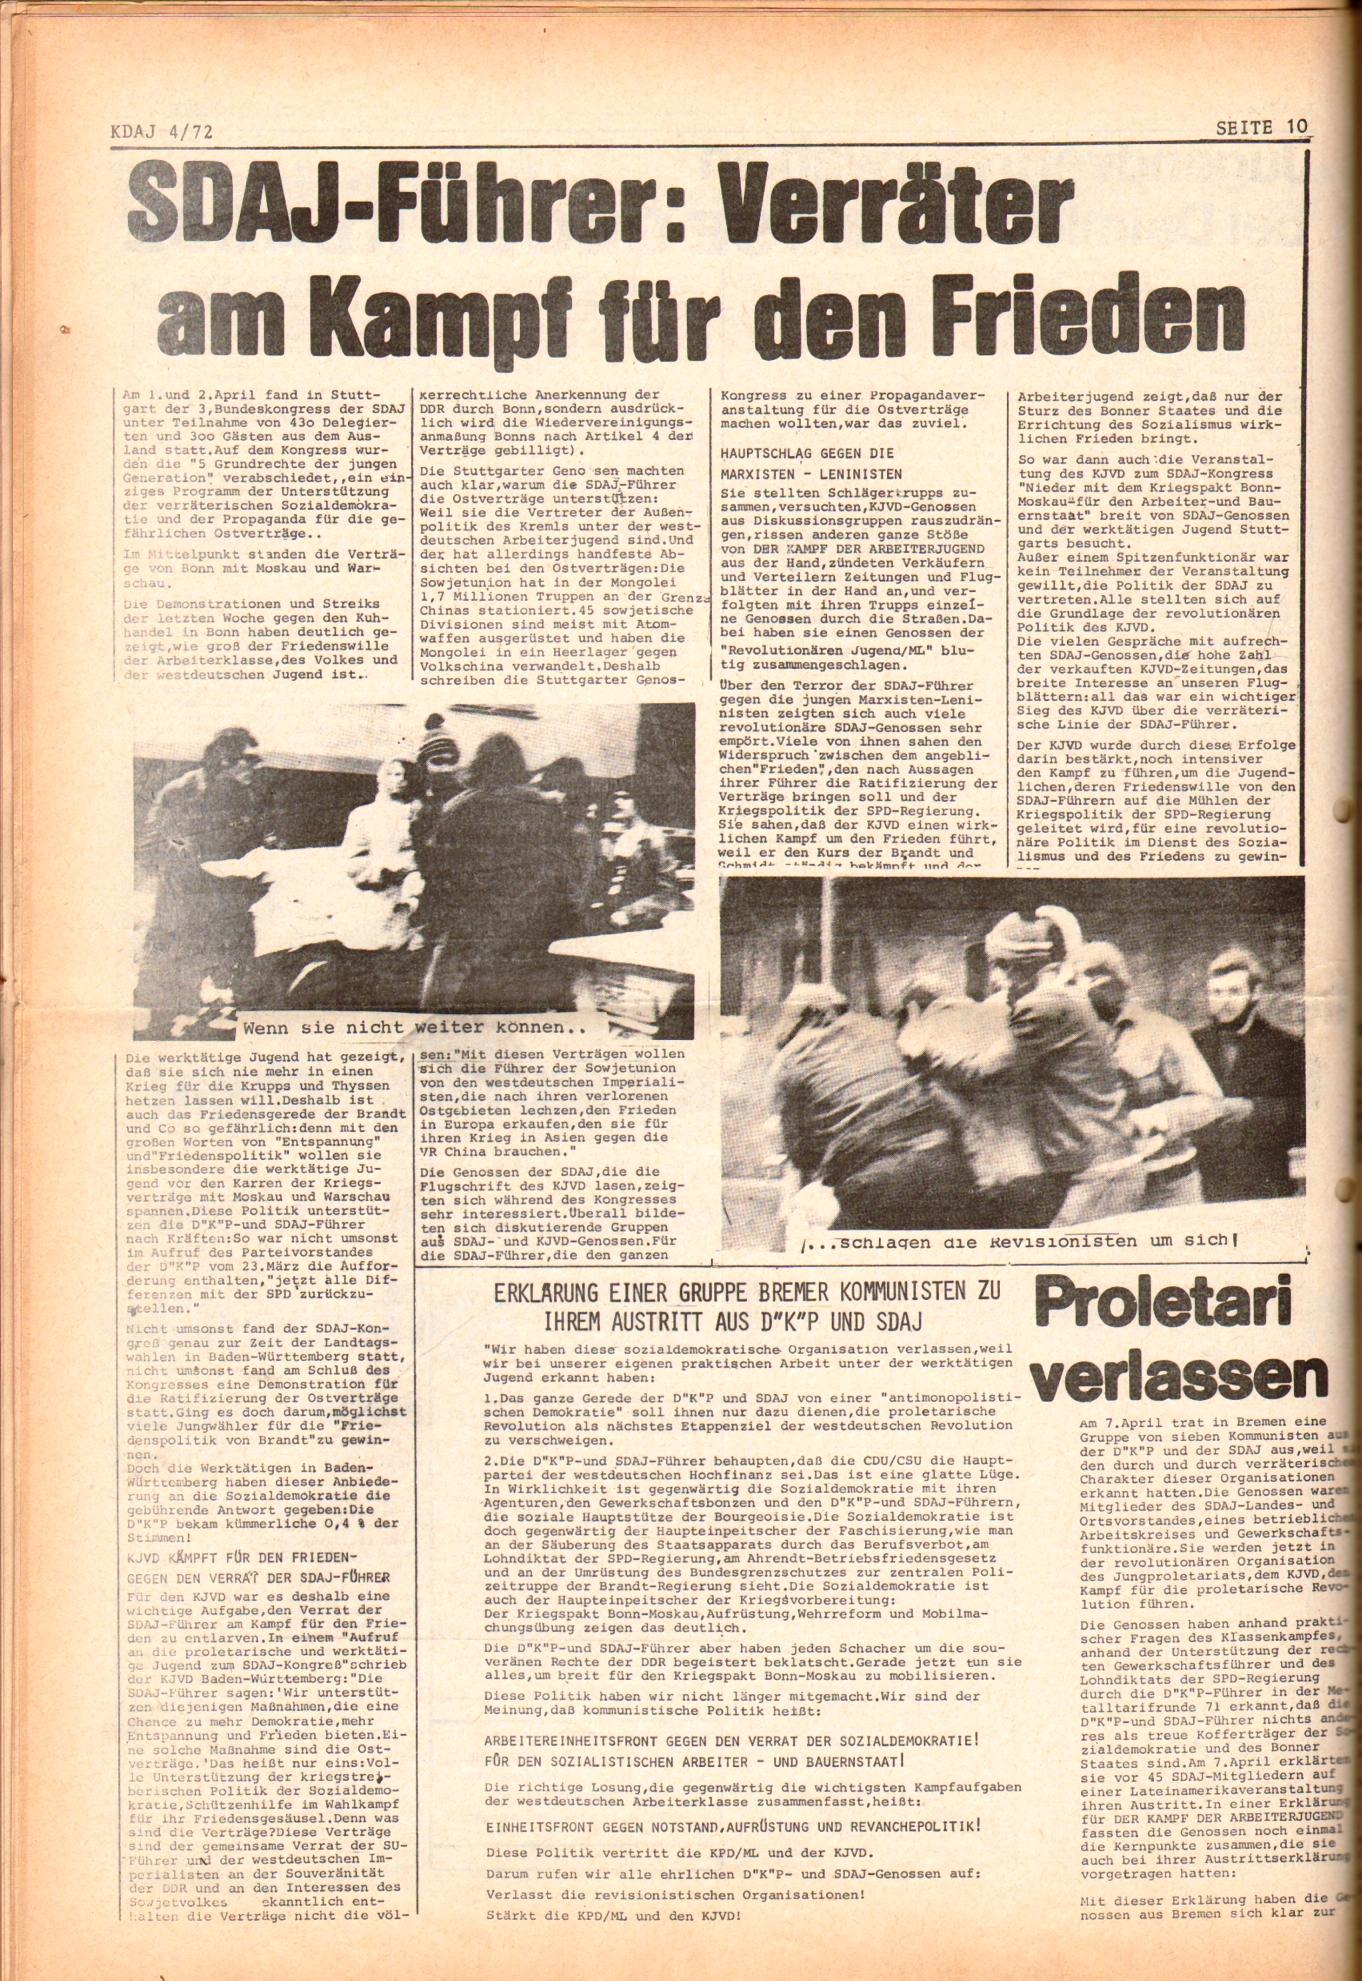 KDAJ, 3. Jg., Mai 1972, Nr. 4, Seite 10